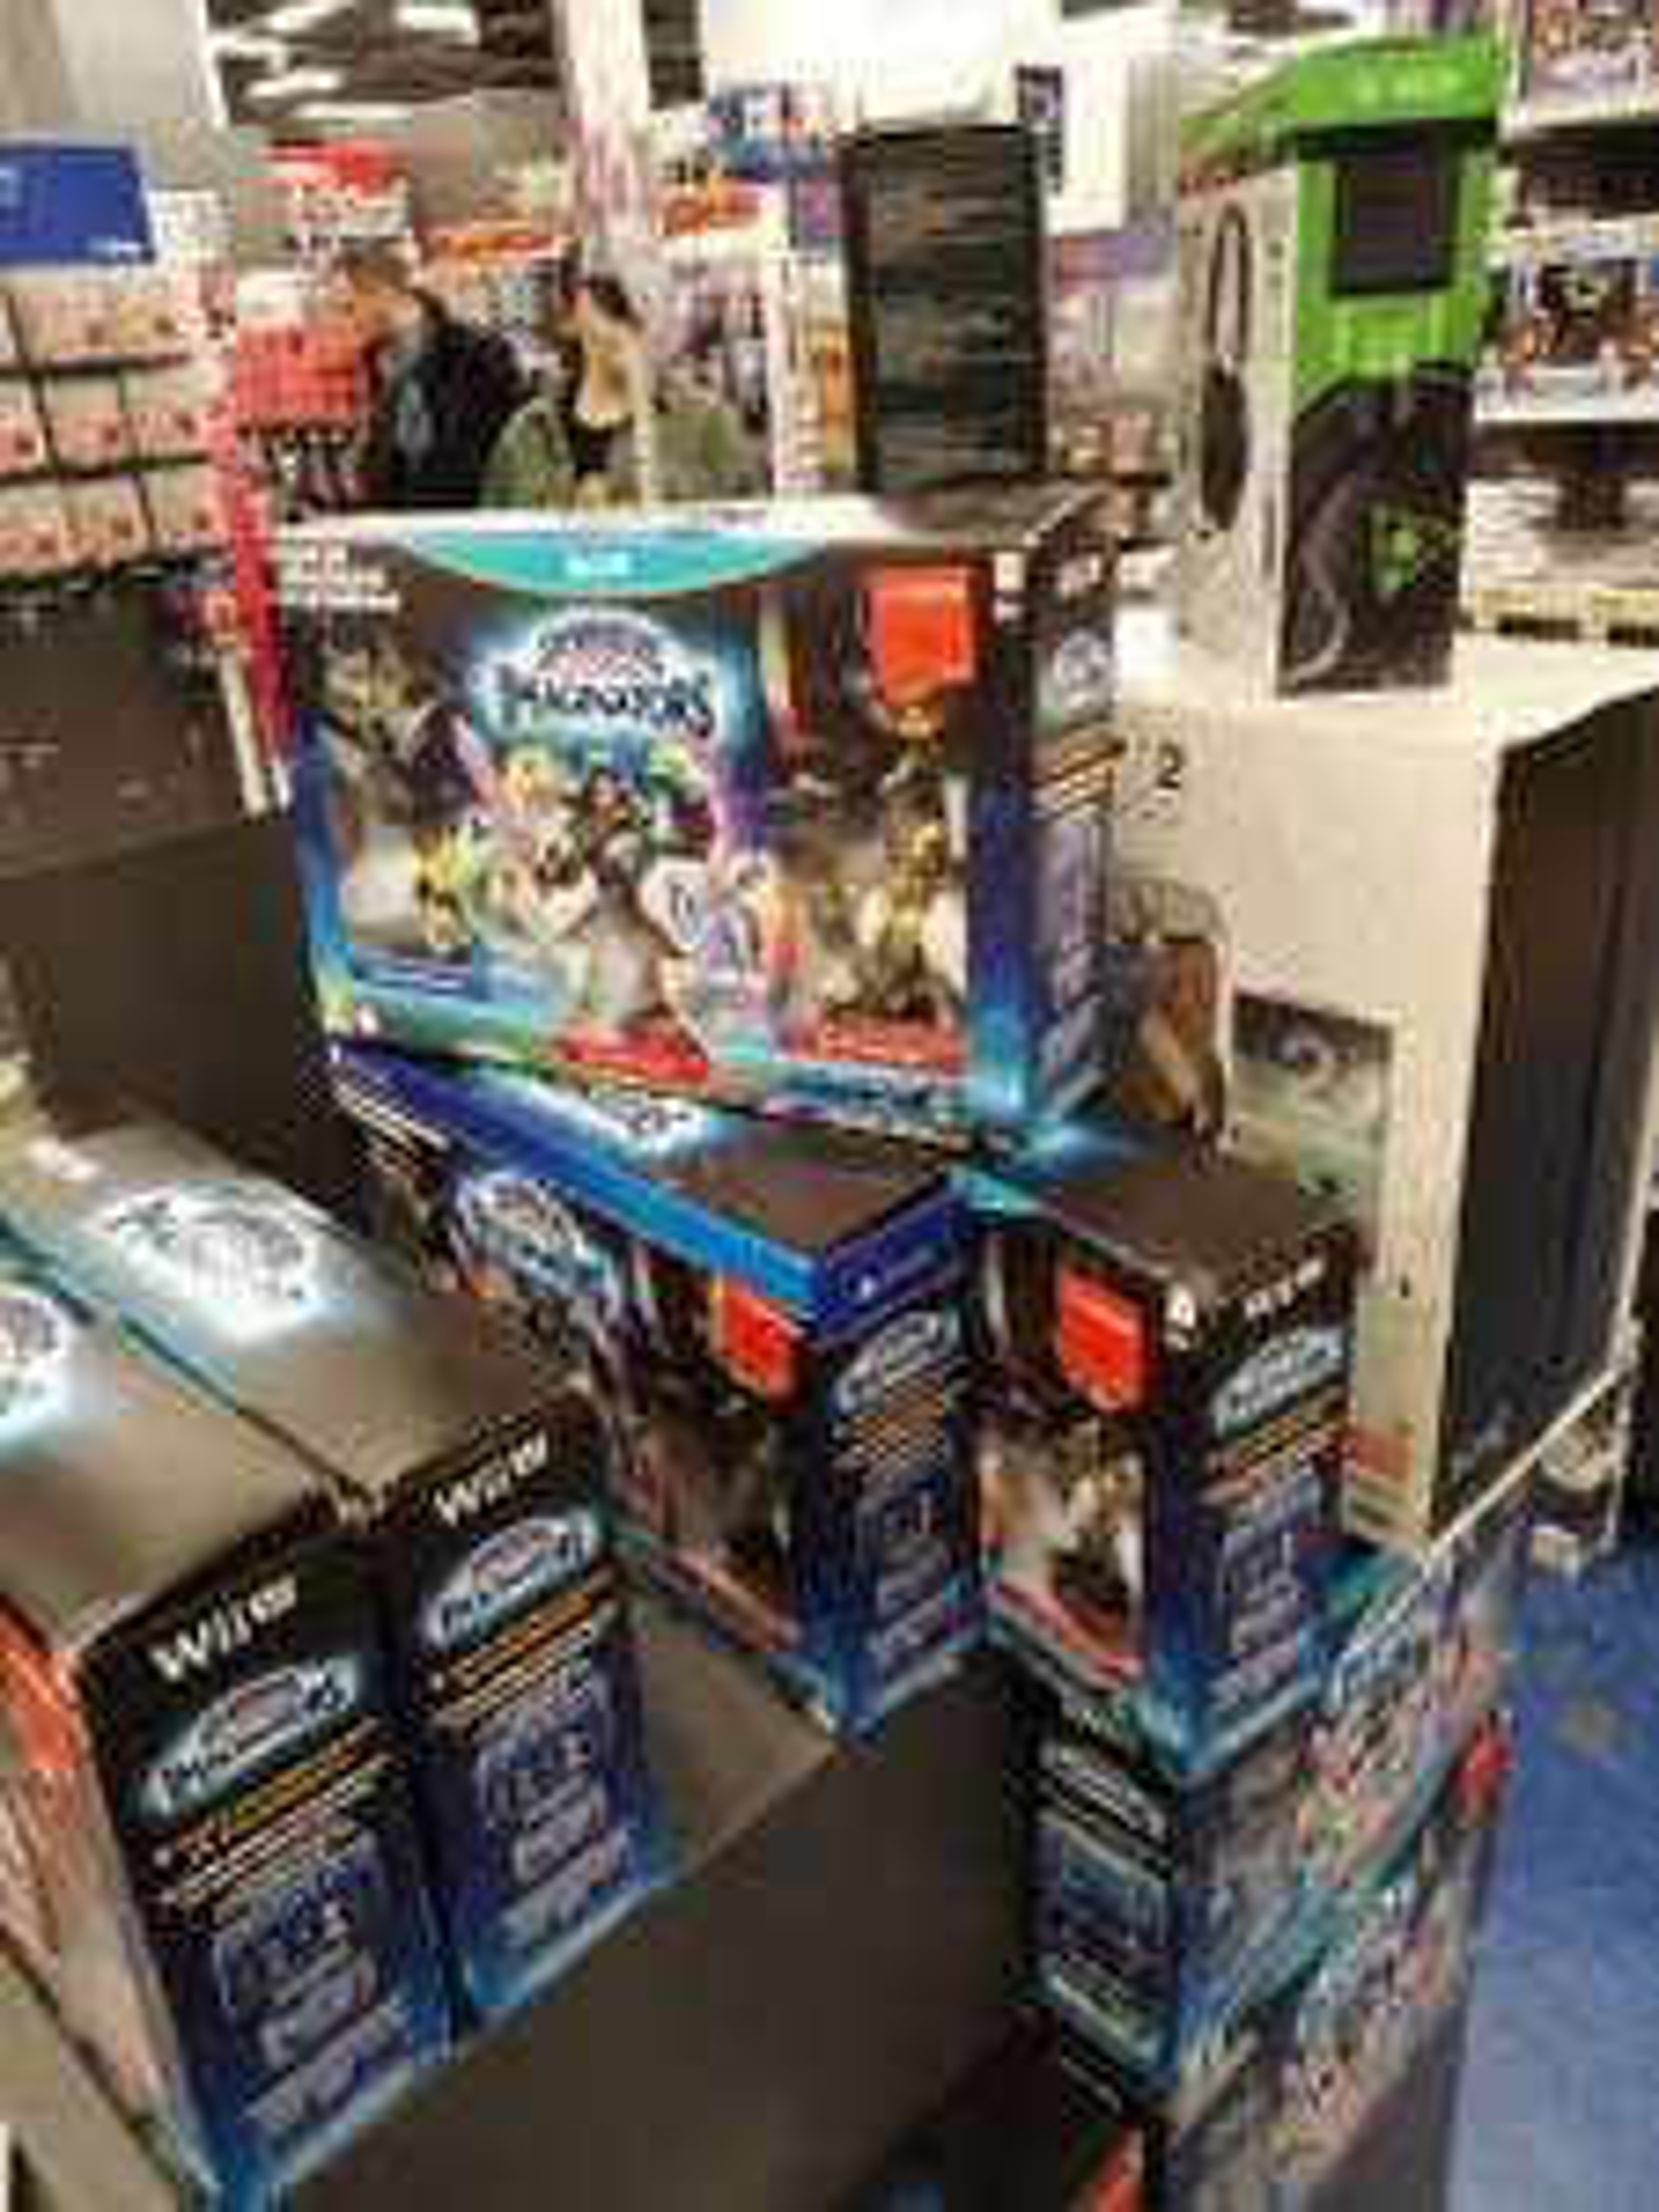 Pack démarrage Skylanders Imaginators sur Wii U - La défense (92)